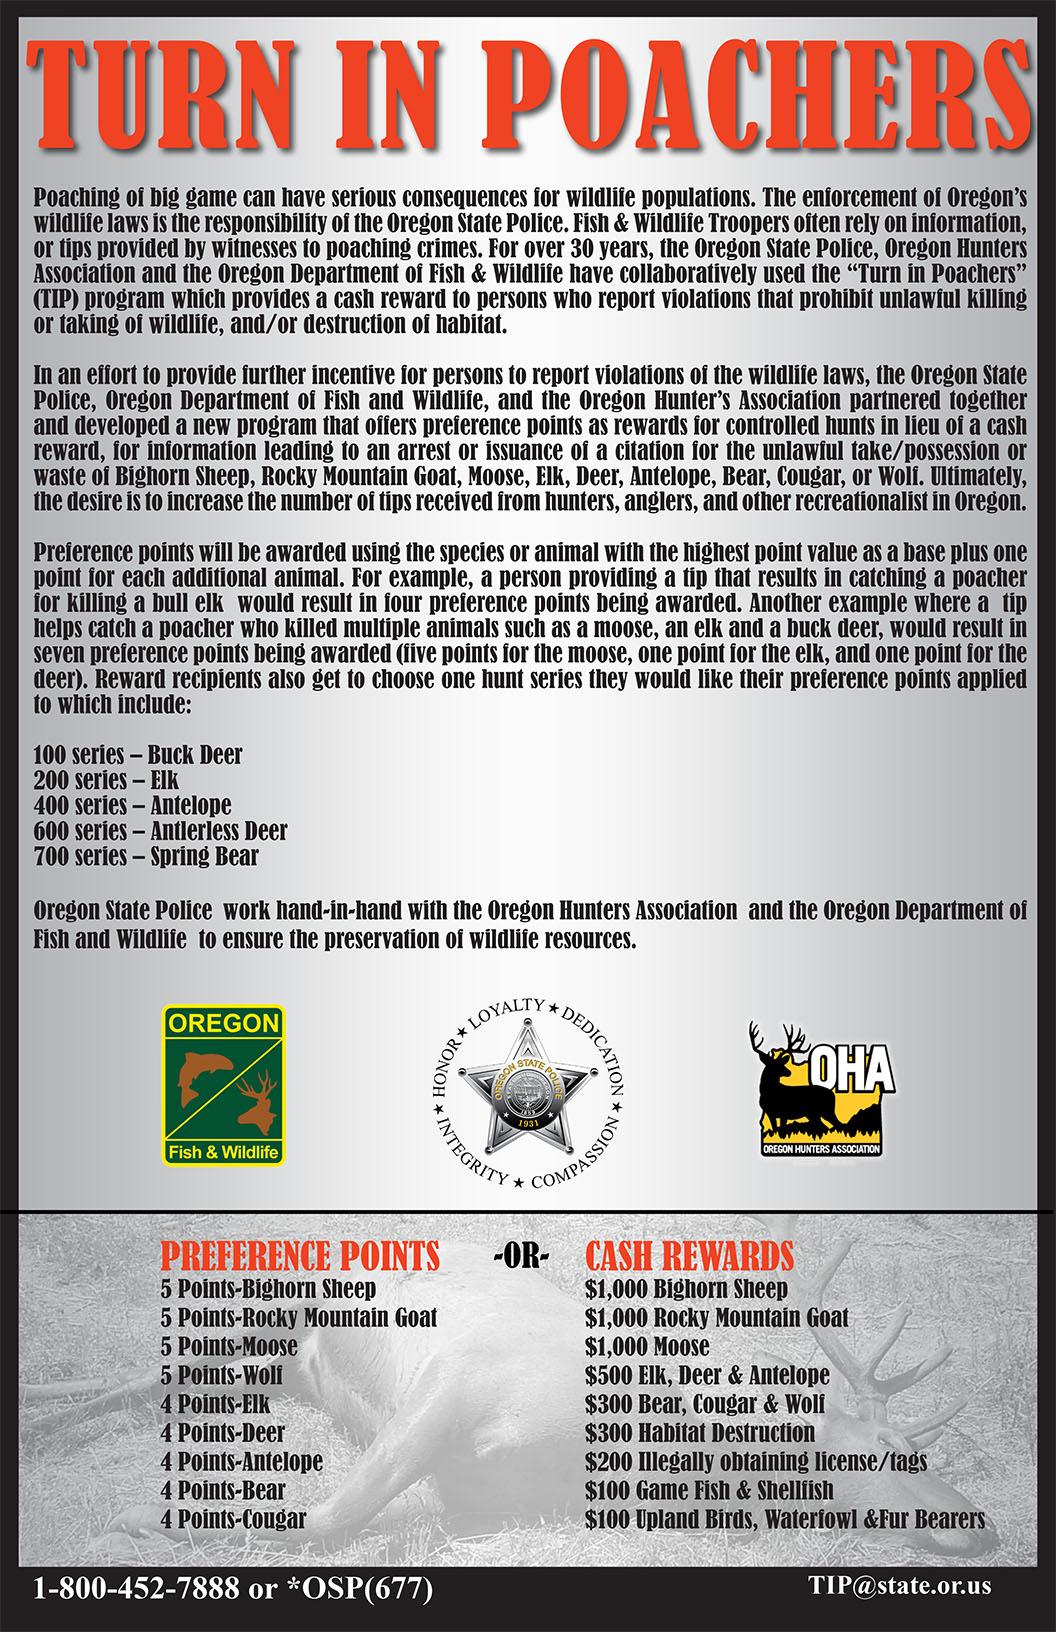 Turn in Poachers (TIP) - Oregon Hunters Association: OHA